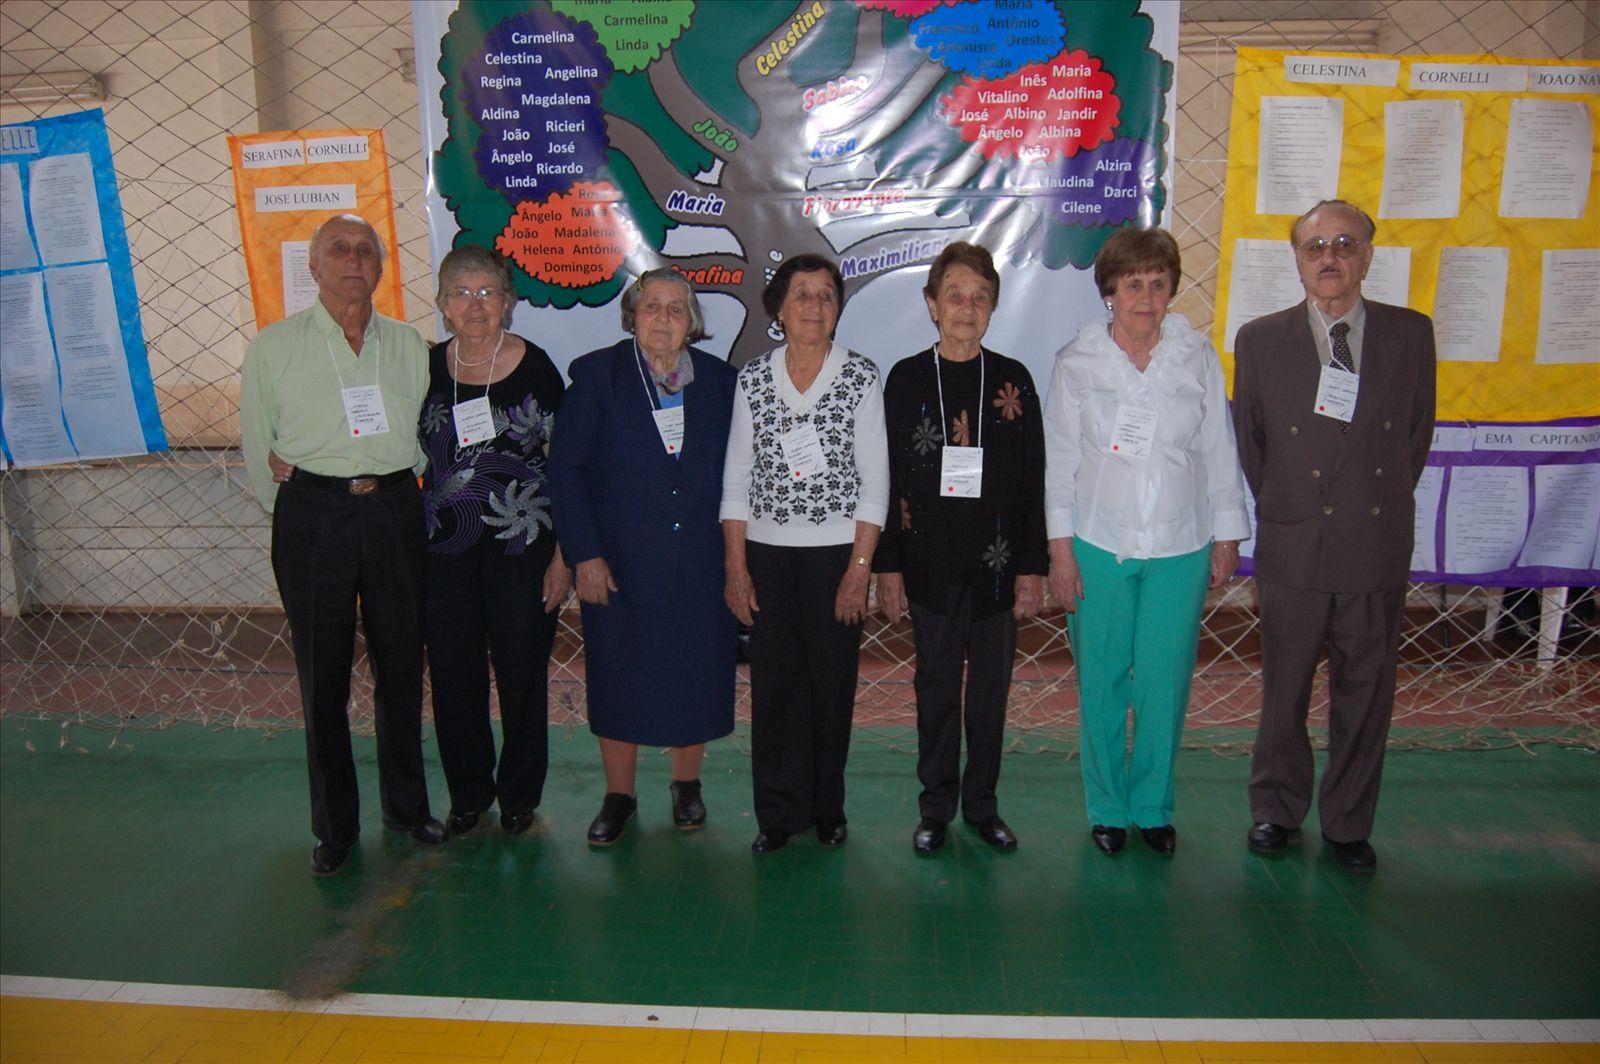 2º Encontro Família Cornelli - 11.10.2009 (71)_0